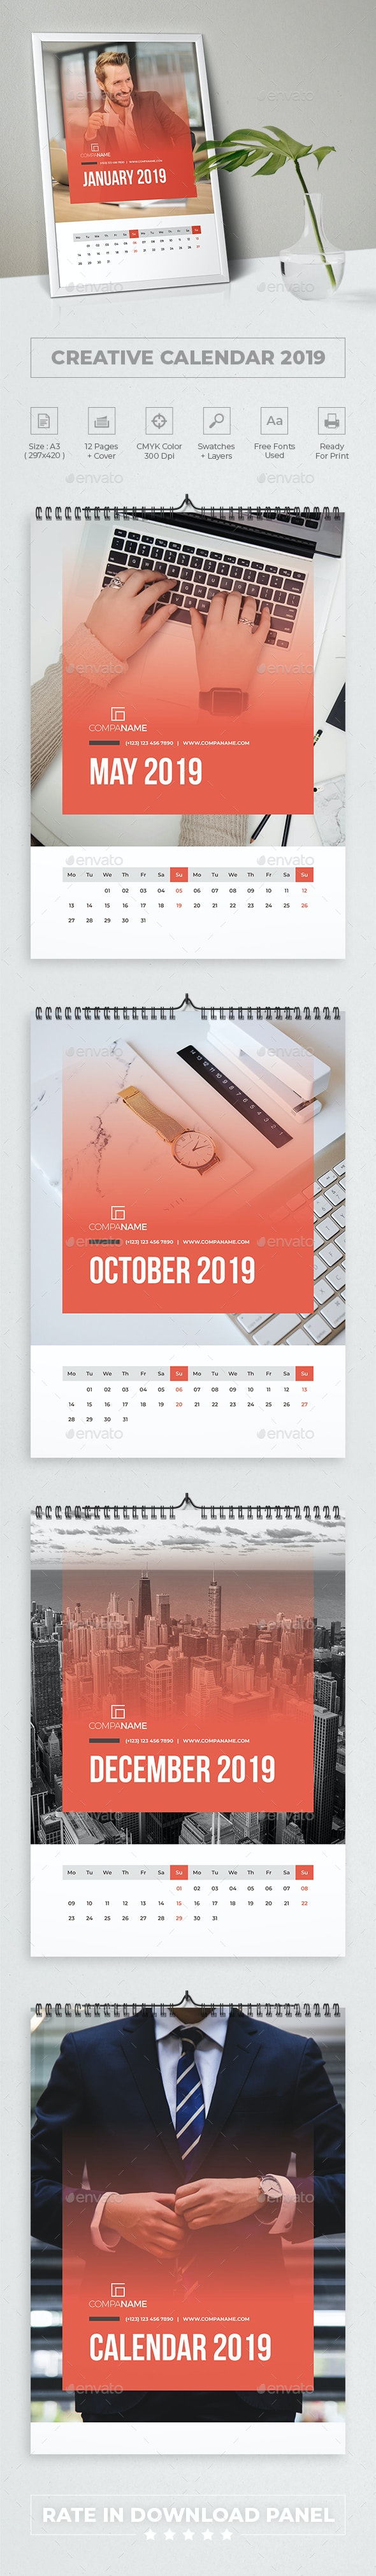 Creative Calendar 2019 - Calendars Stationery